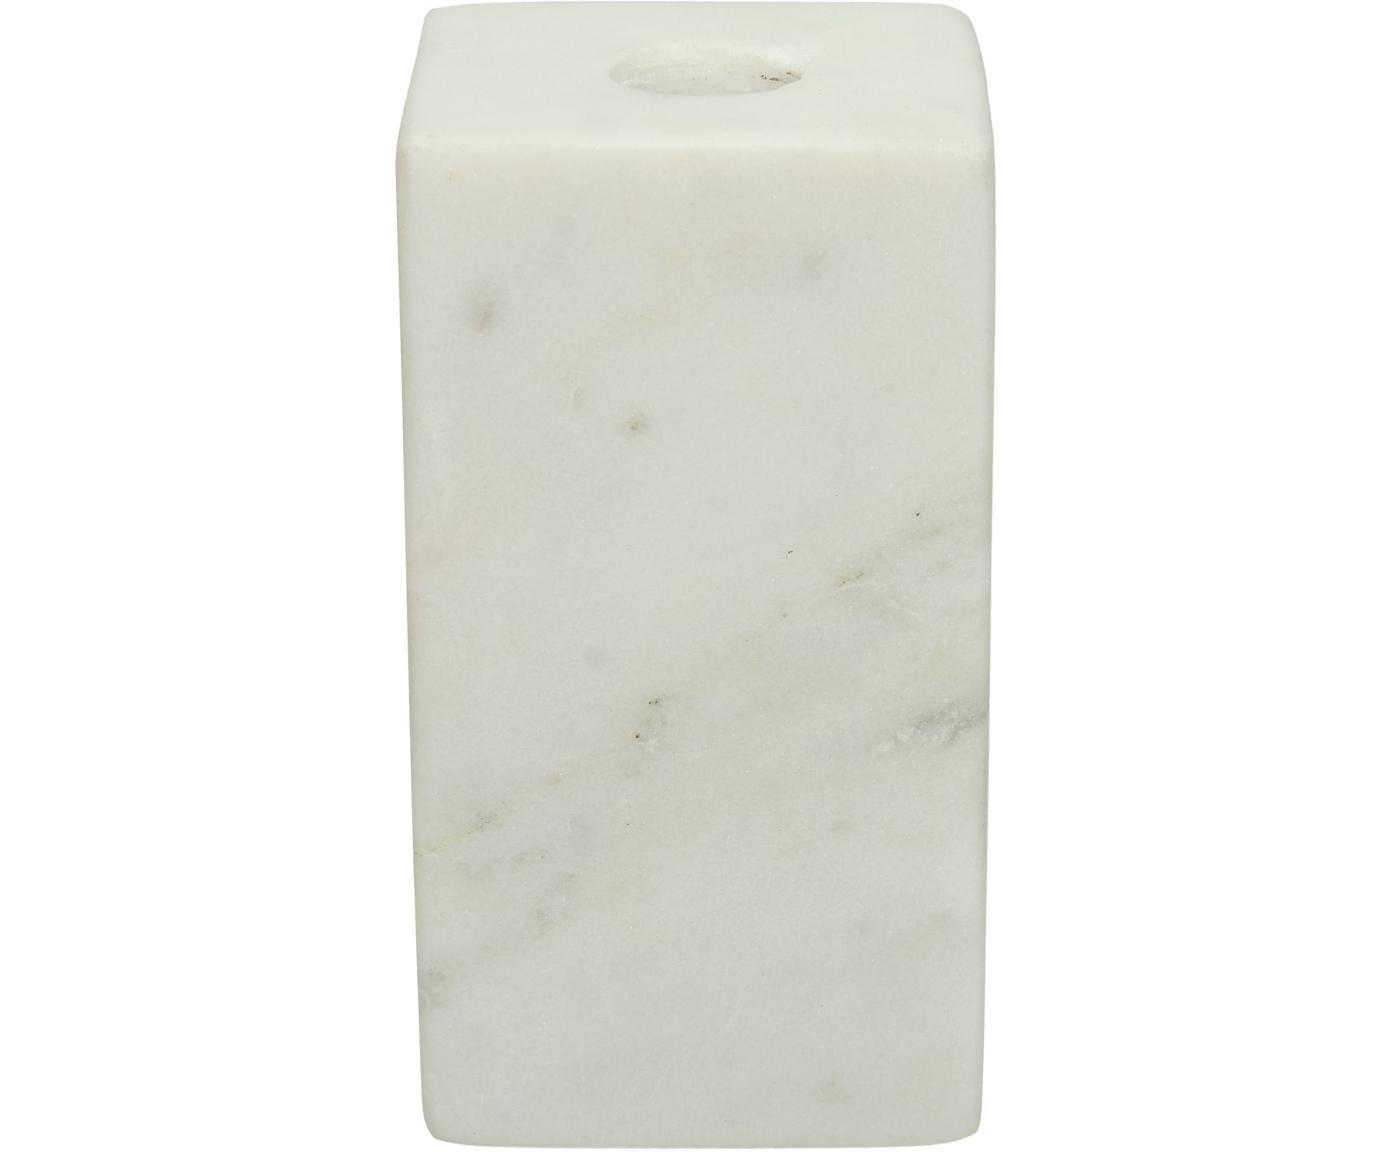 Candelabro de mármol Marble, Mármol, Blanco, An 6 x Al 11 cm